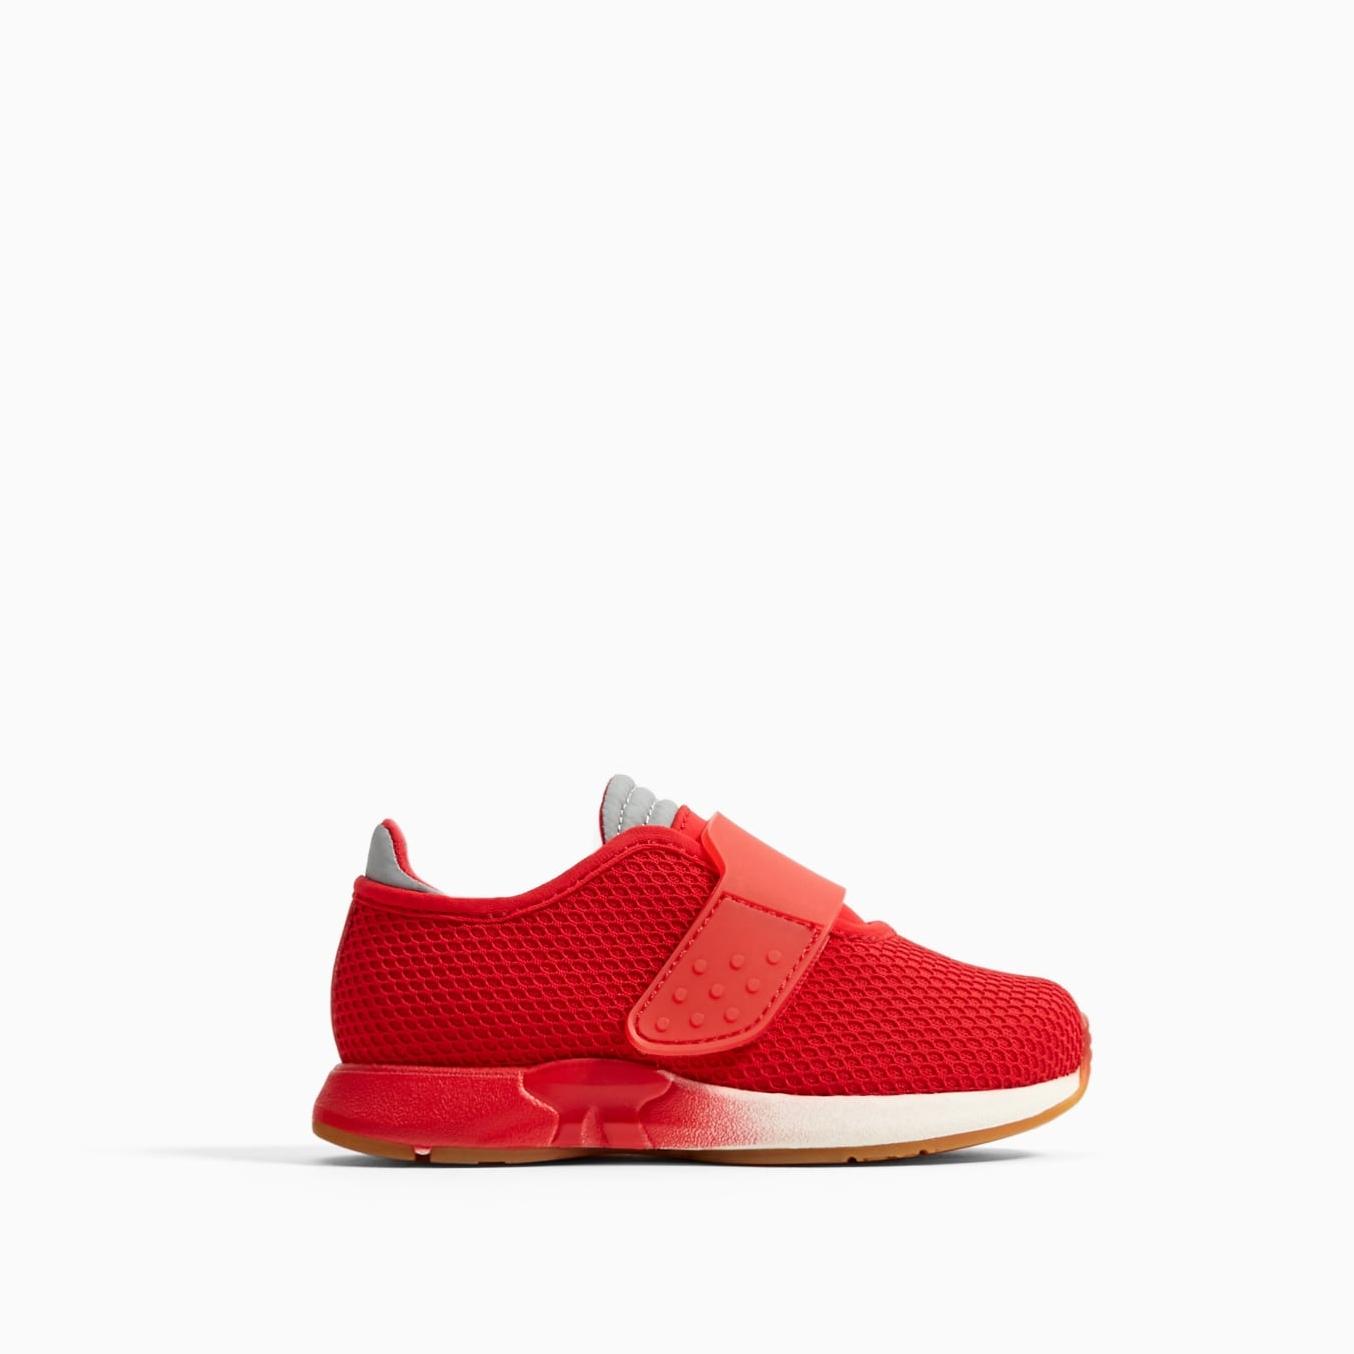 Monochrome Sneakers $39.95